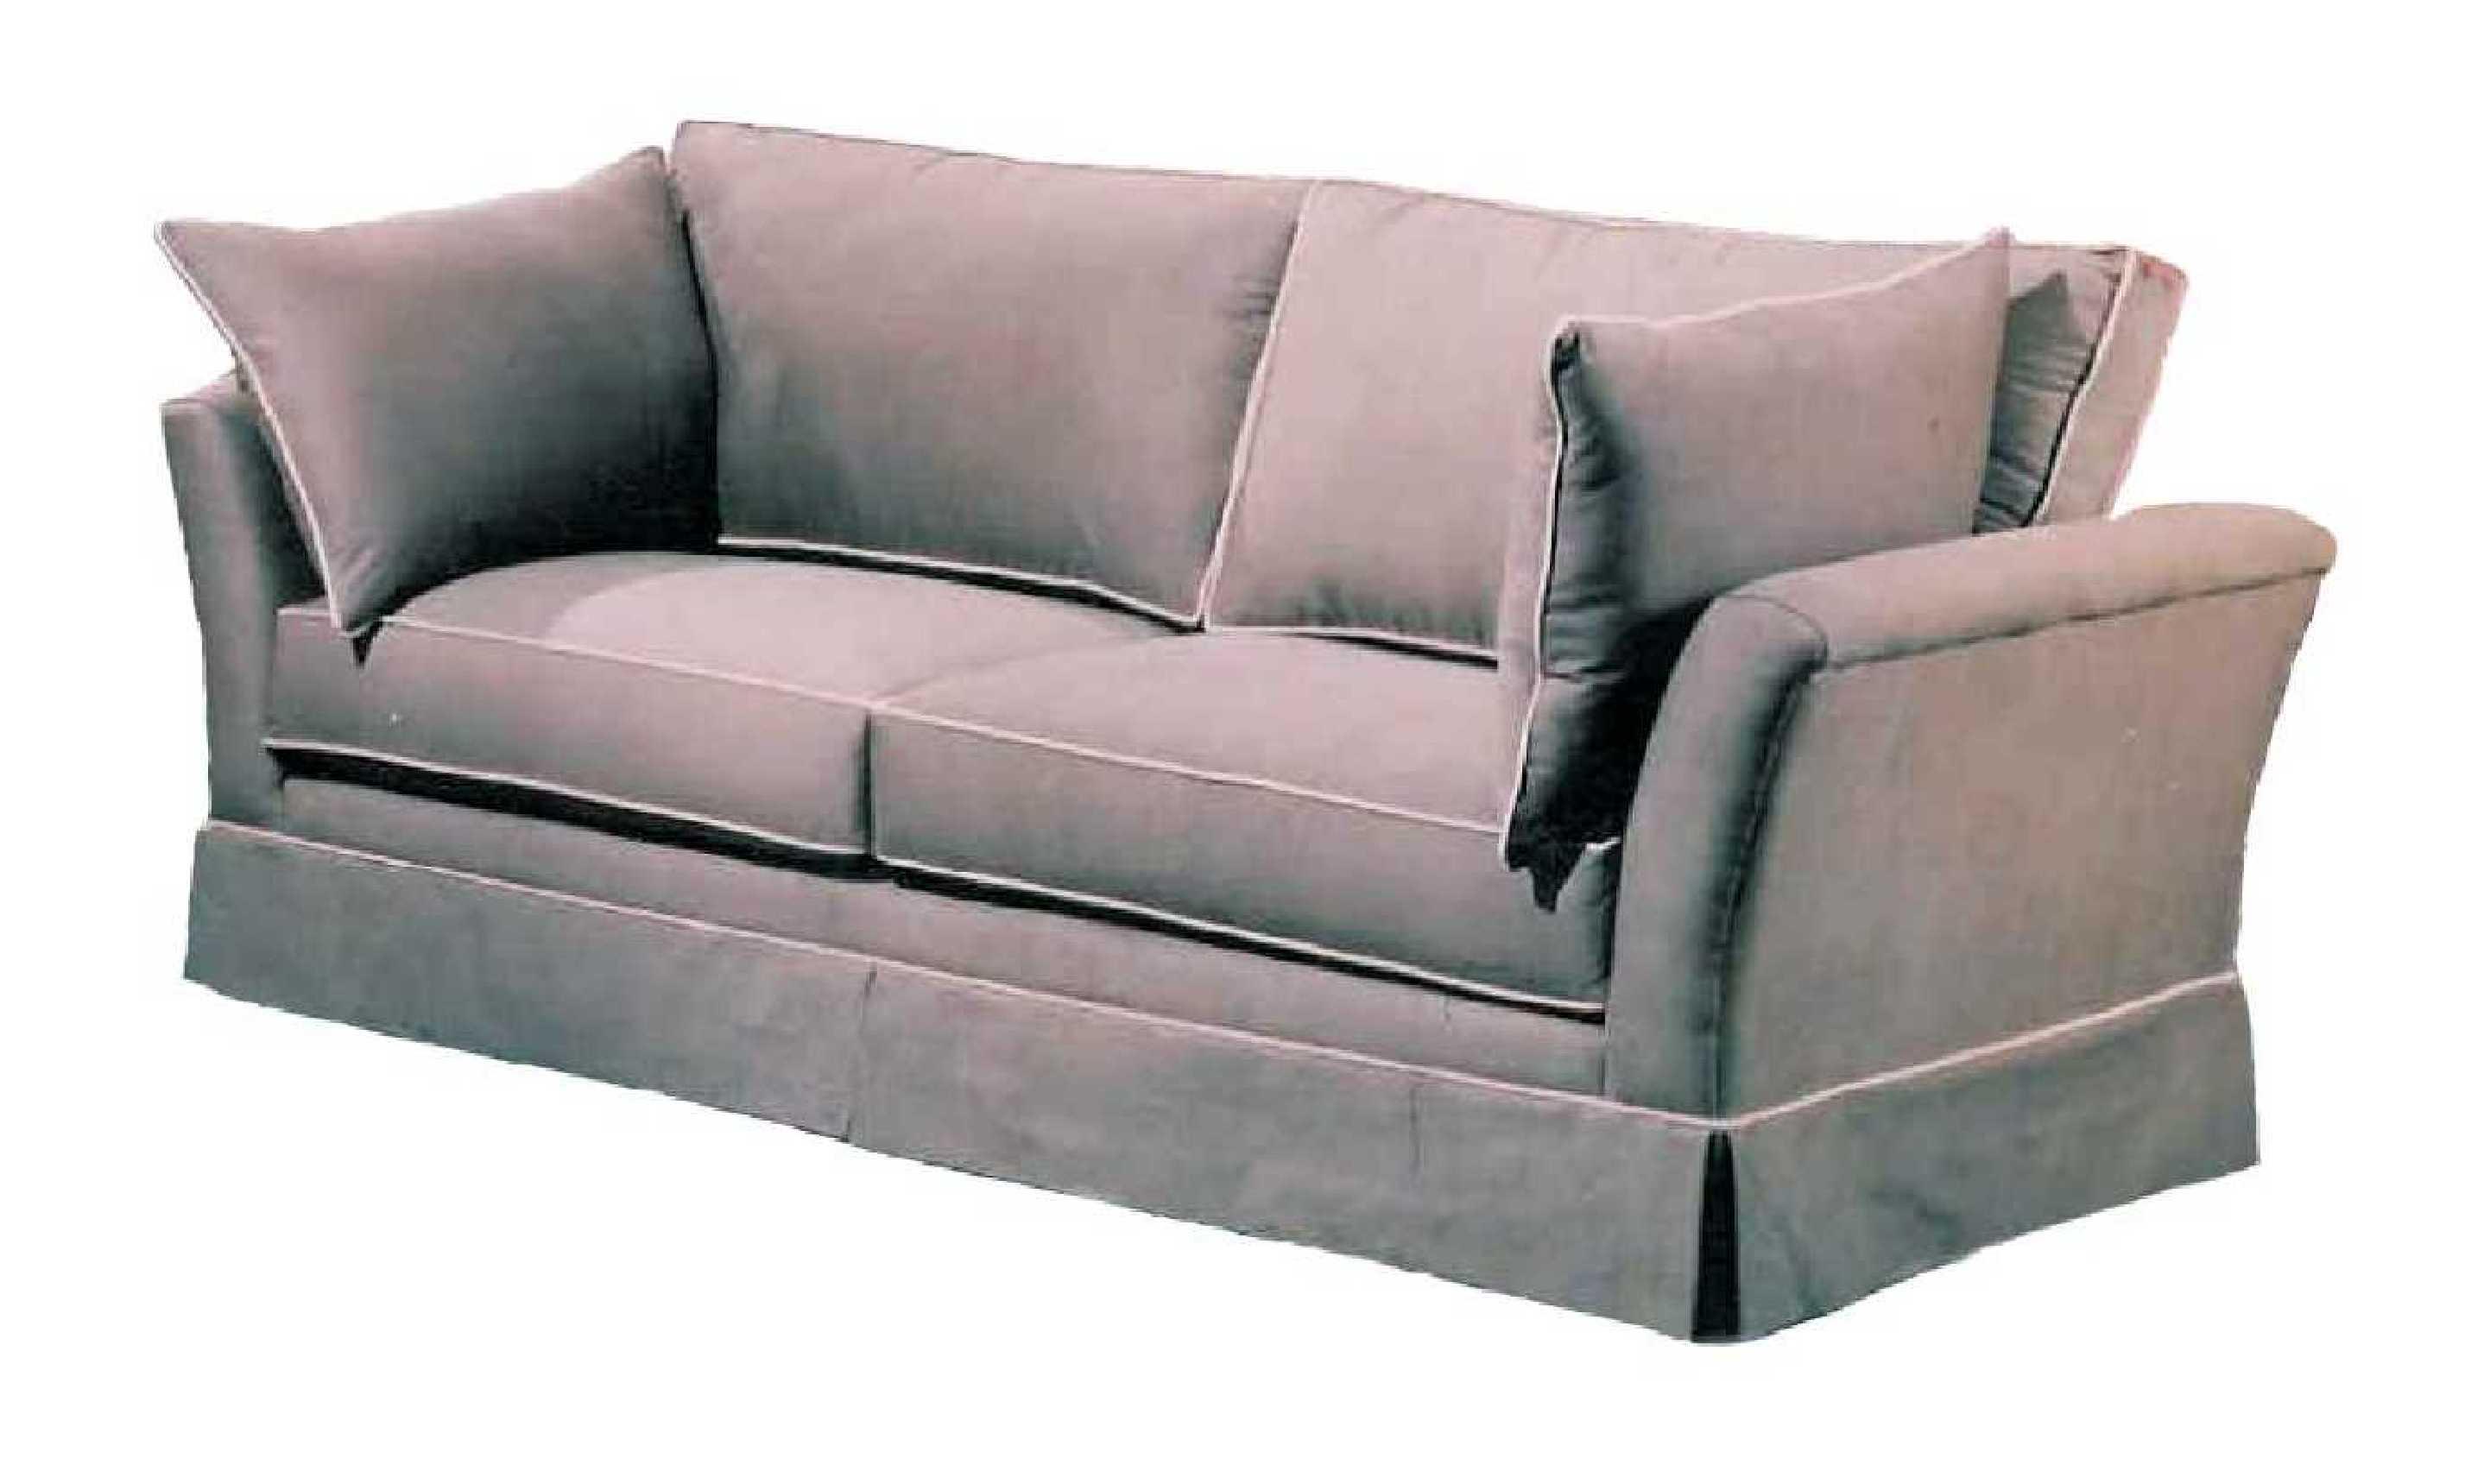 La Cienega Sofa Factory